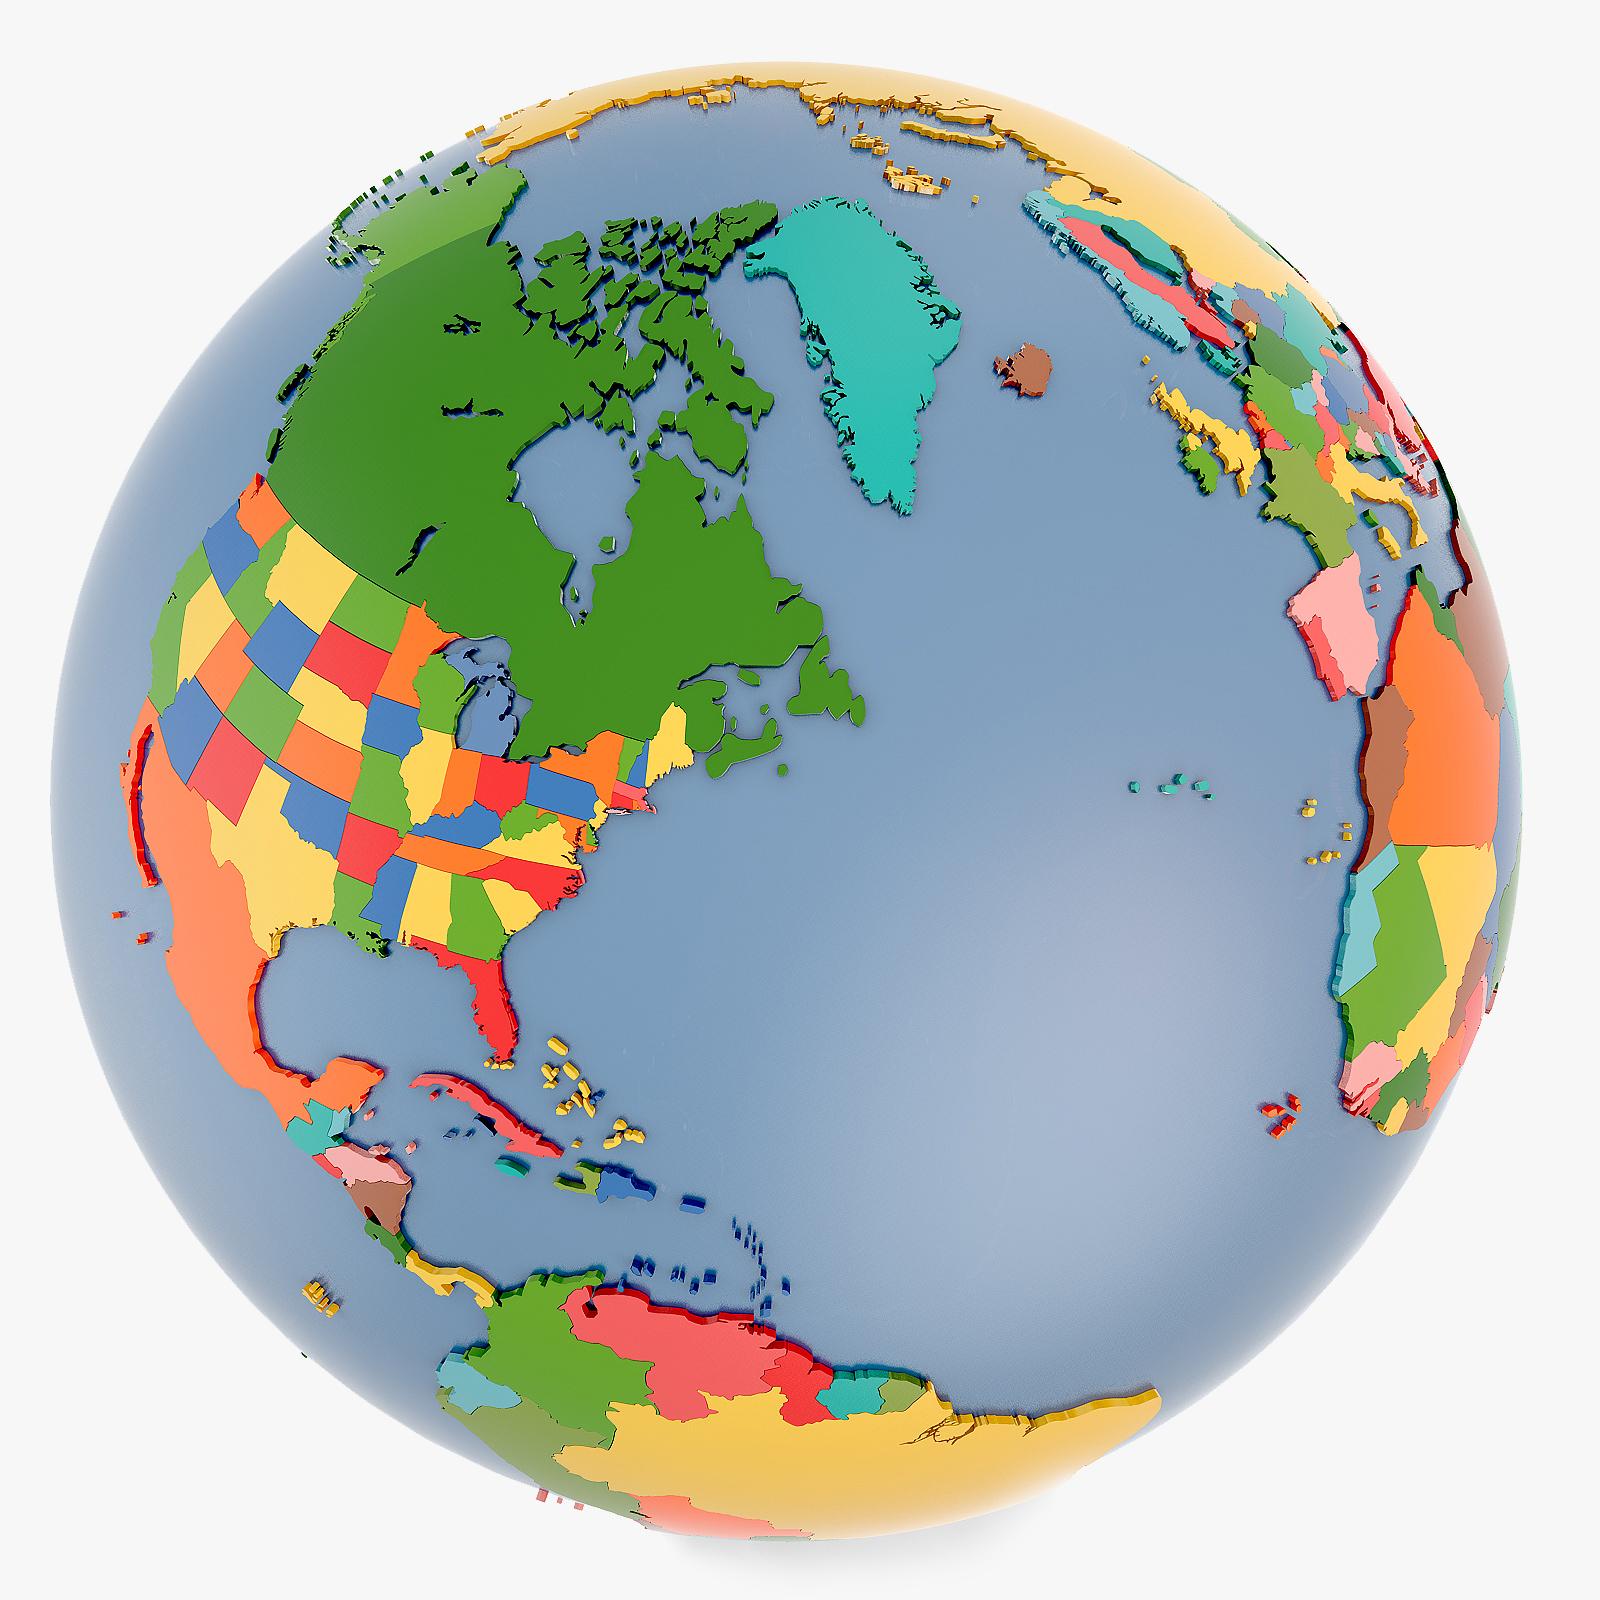 Geopolitical Globe and US States on globe az map, globe background, globe mac, earth3d, globe map outline, globe map design, bing maps platform, 3d world atlas, globe map office, globe photoshop, globe map art, globe view, globe with grid lines, life with playstation, globe and health, globe map black and white, globe map cartoon, globe clip art, globe map projection, globe map print, globe map vector, globe map drawing, globe map illustration, globe map with oceans, bing maps,